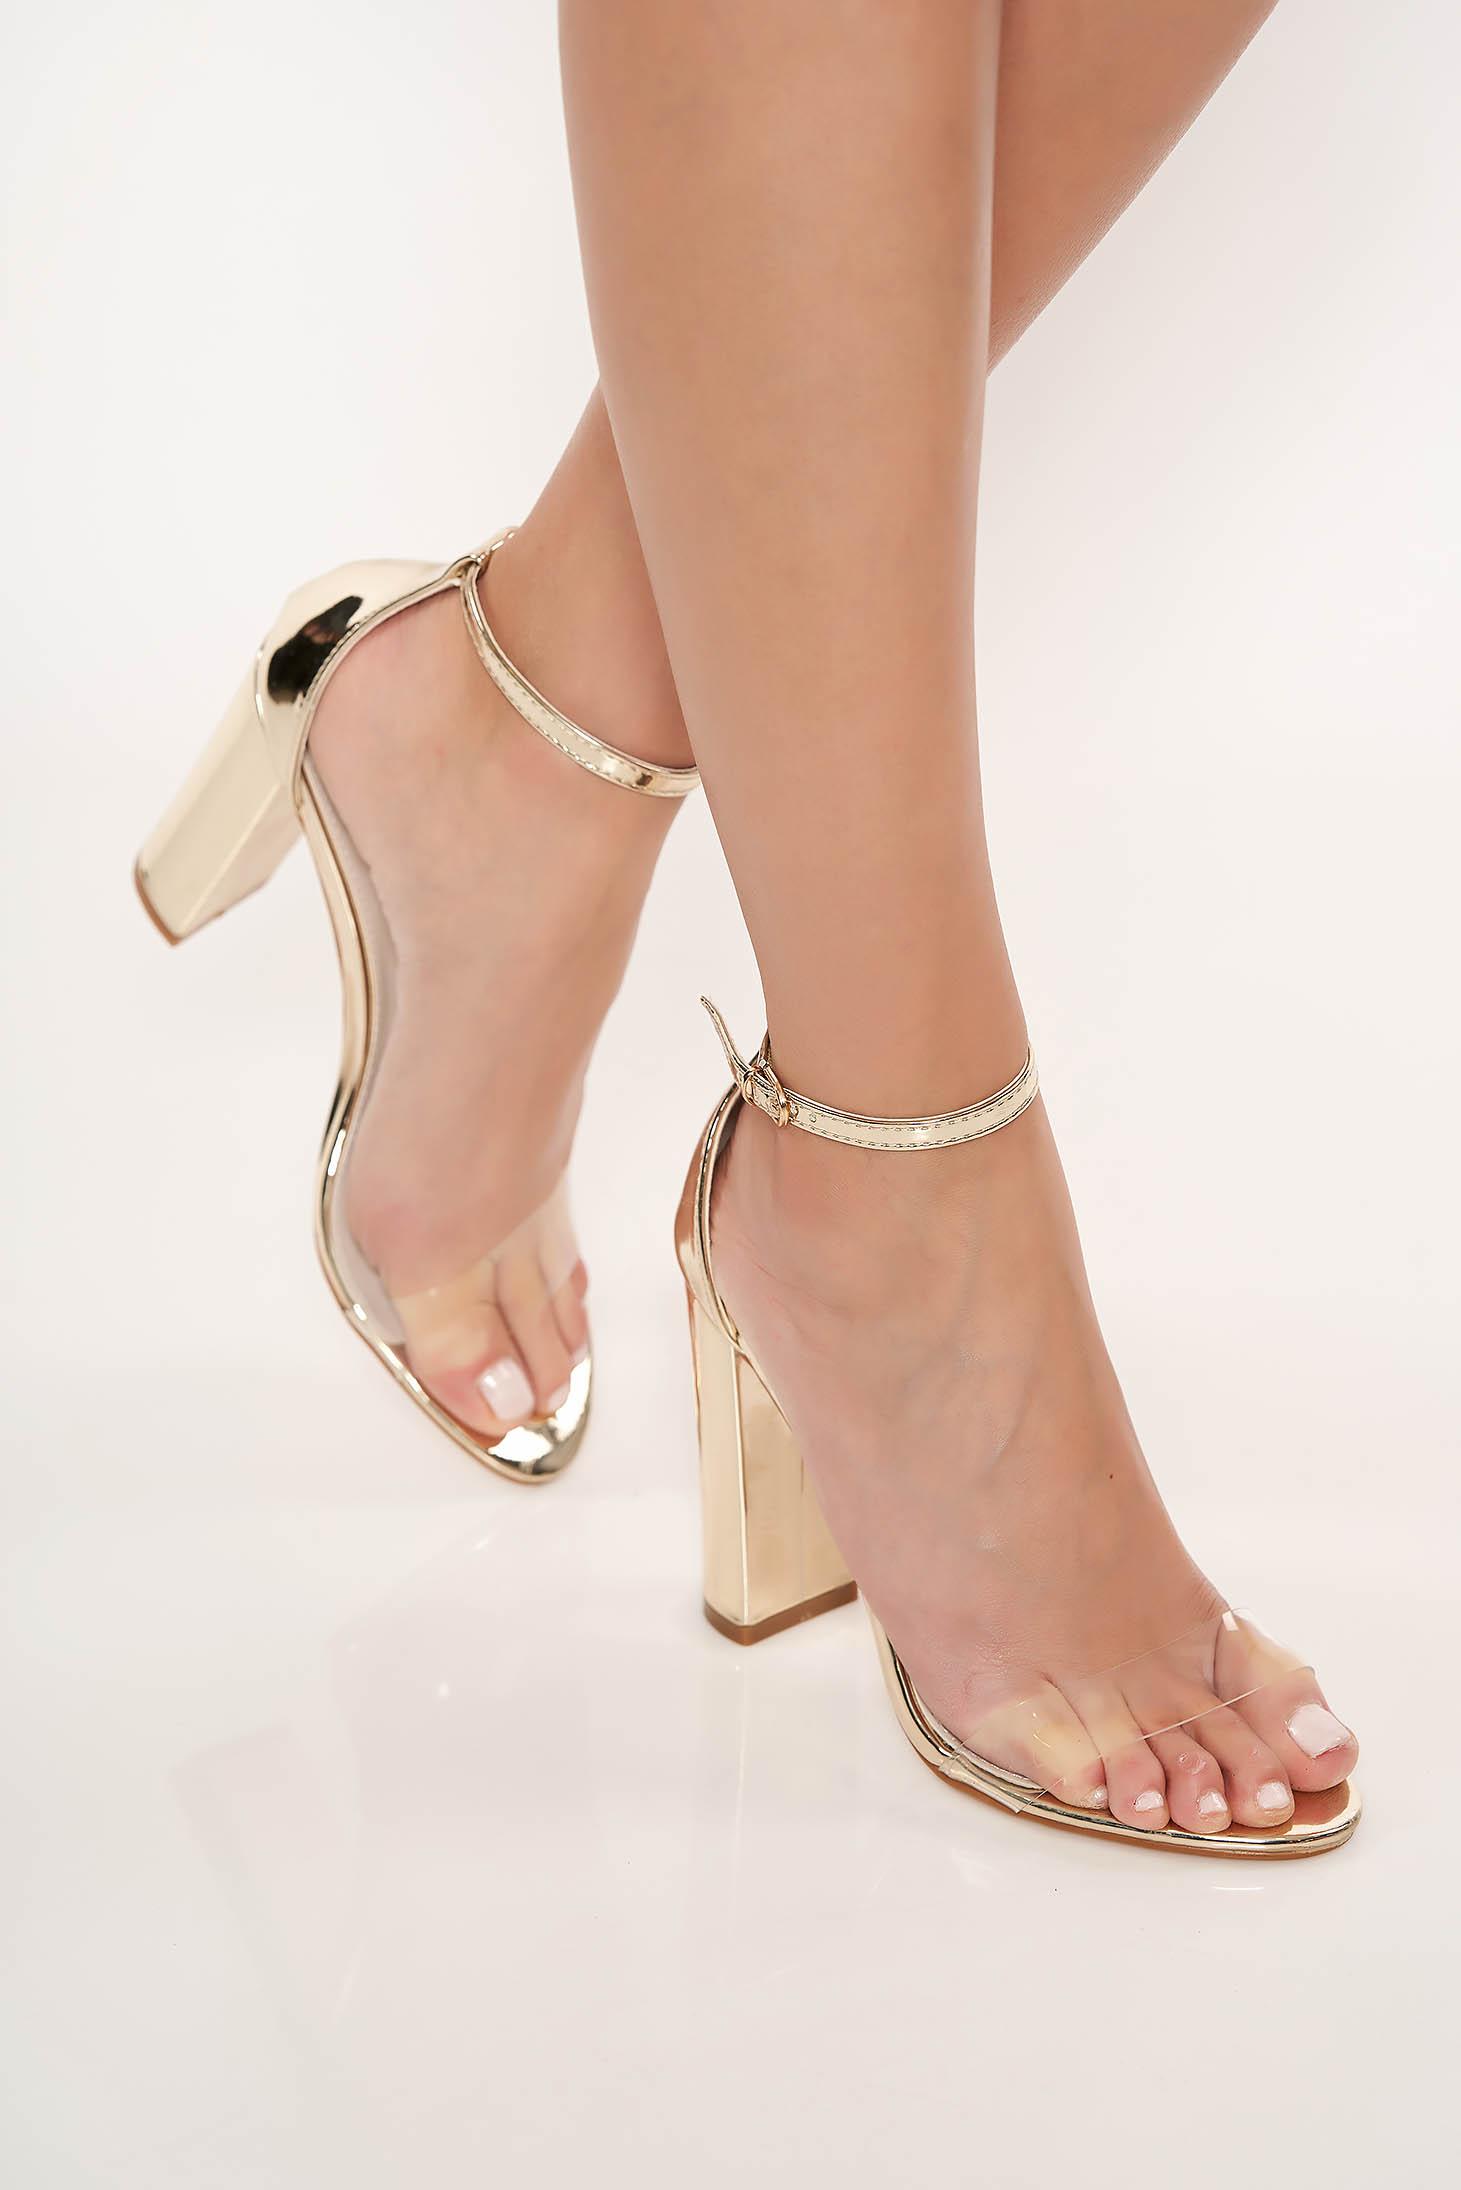 Sandale aurii elegante din piele ecologica cu barete subtiri cu toc gros